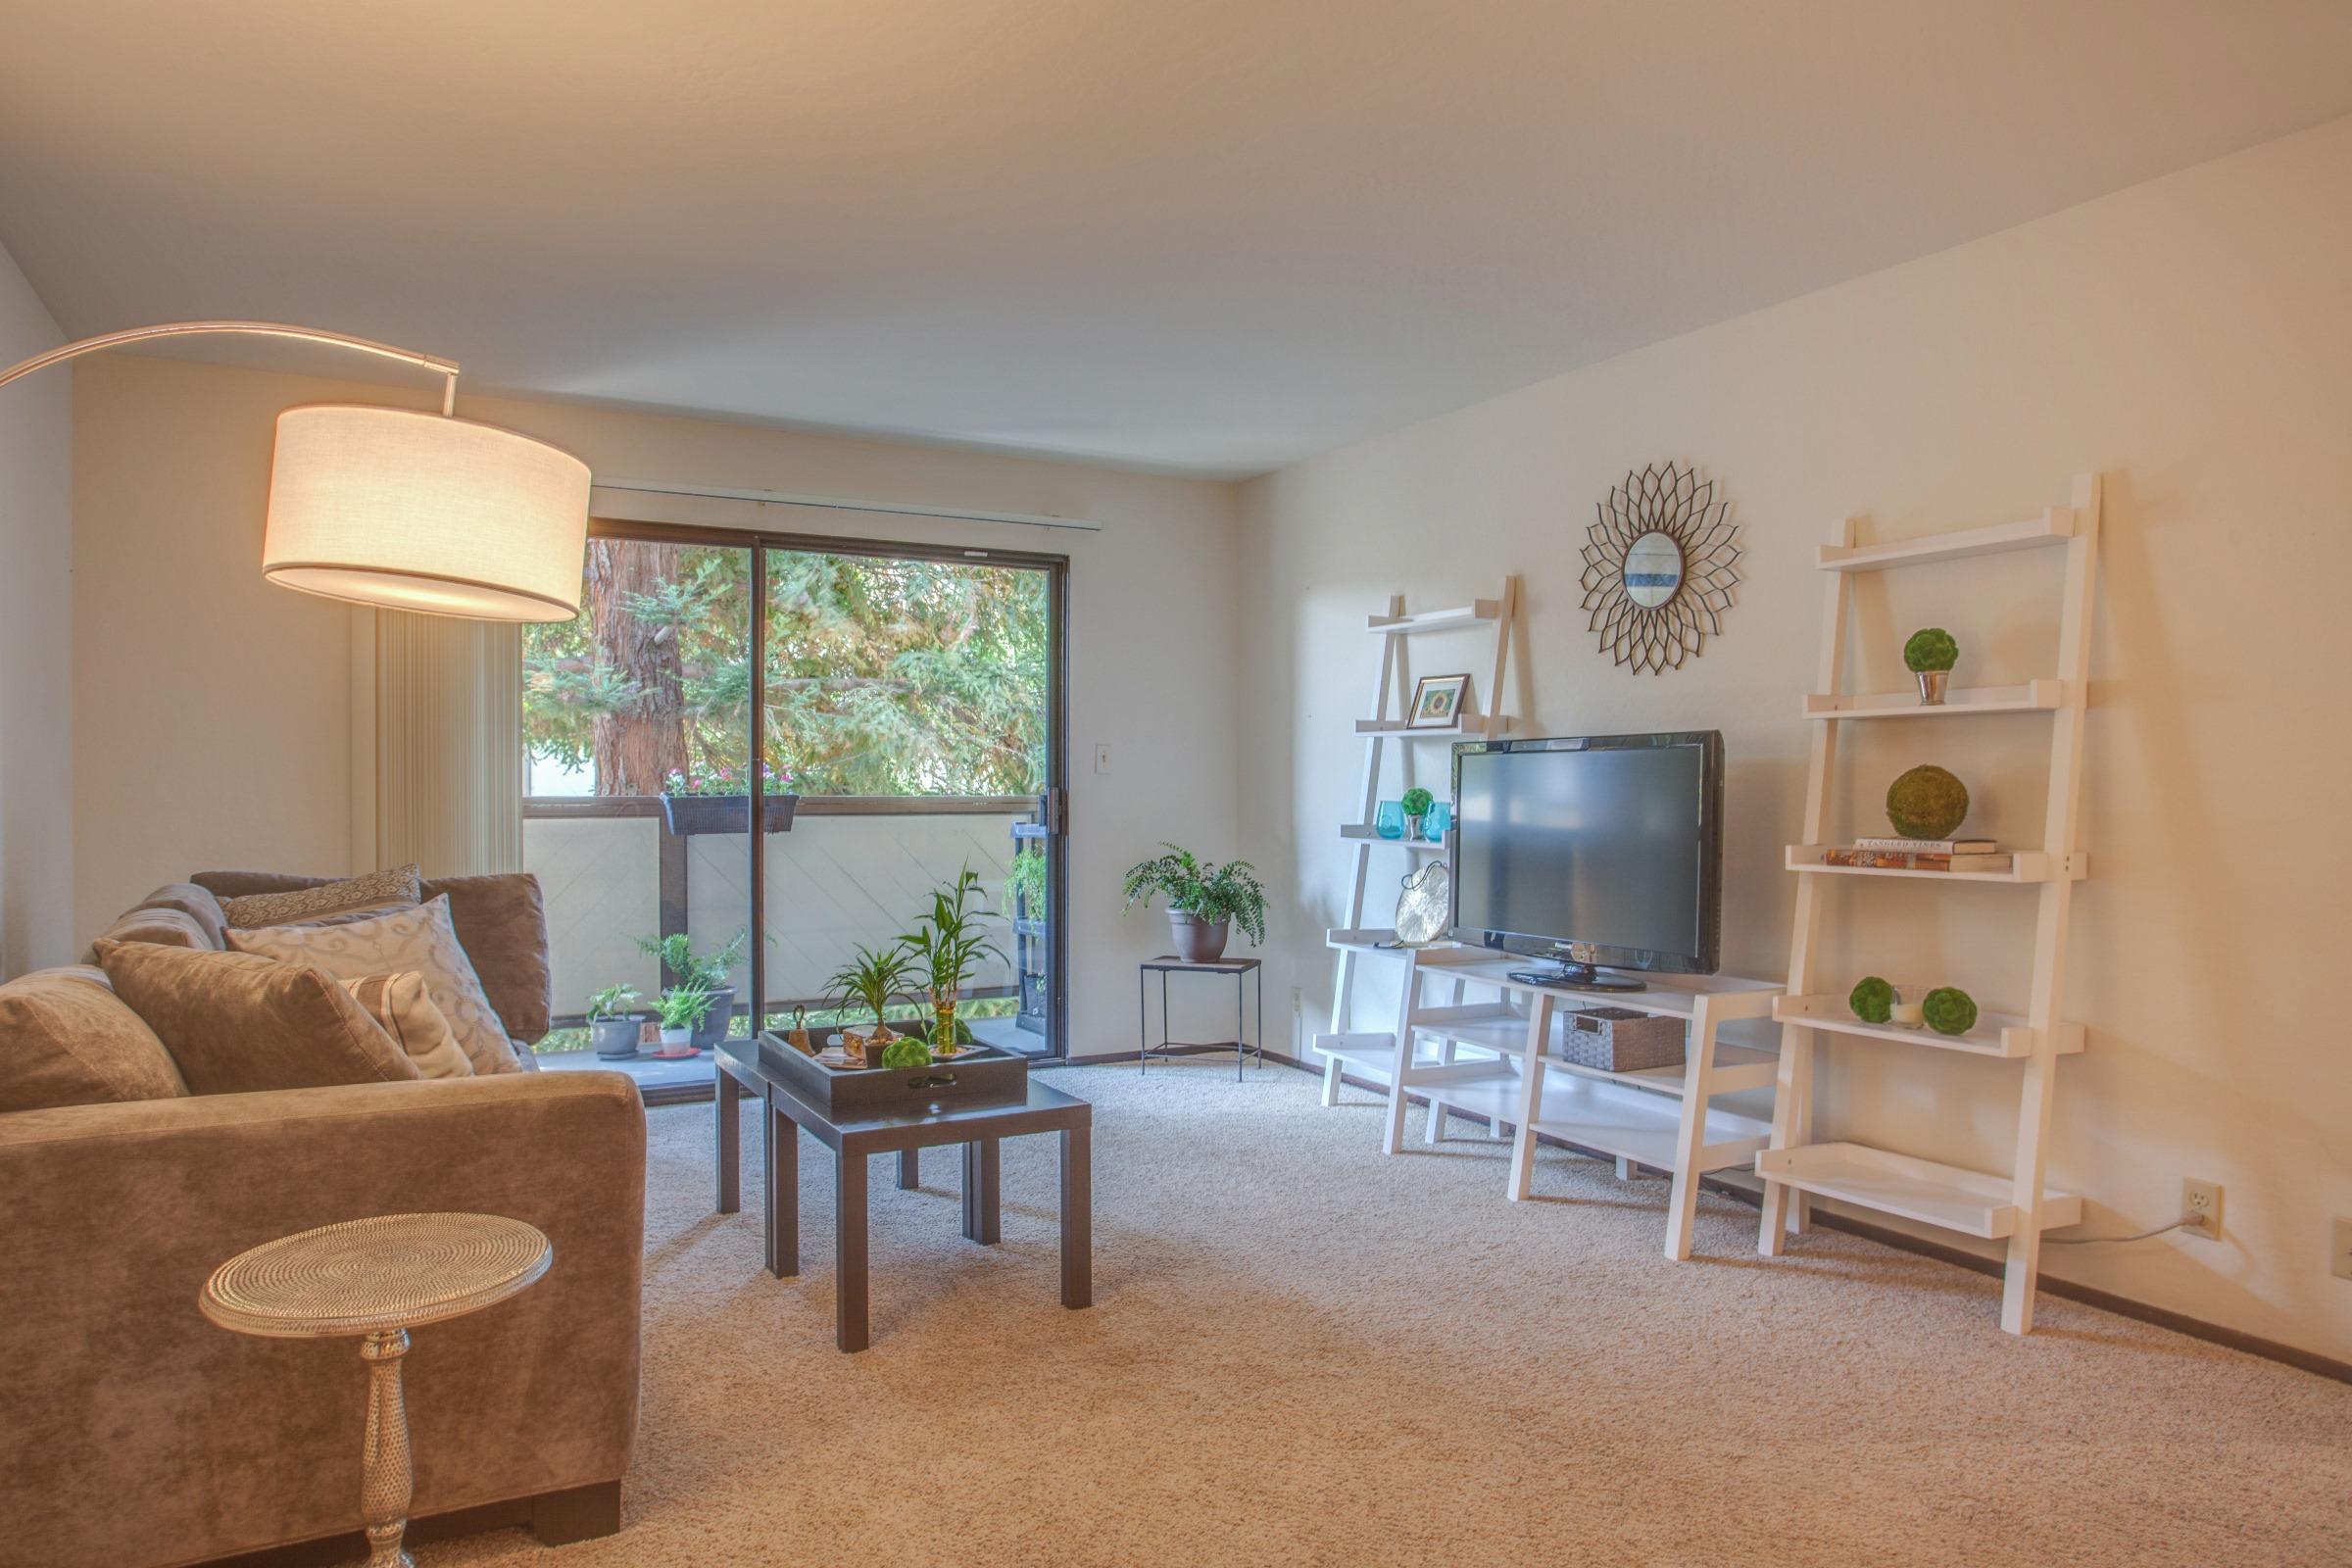 Condominium for Sale at 1021 Marcie Cir., South San Francisco South San Francisco, 94080 United States